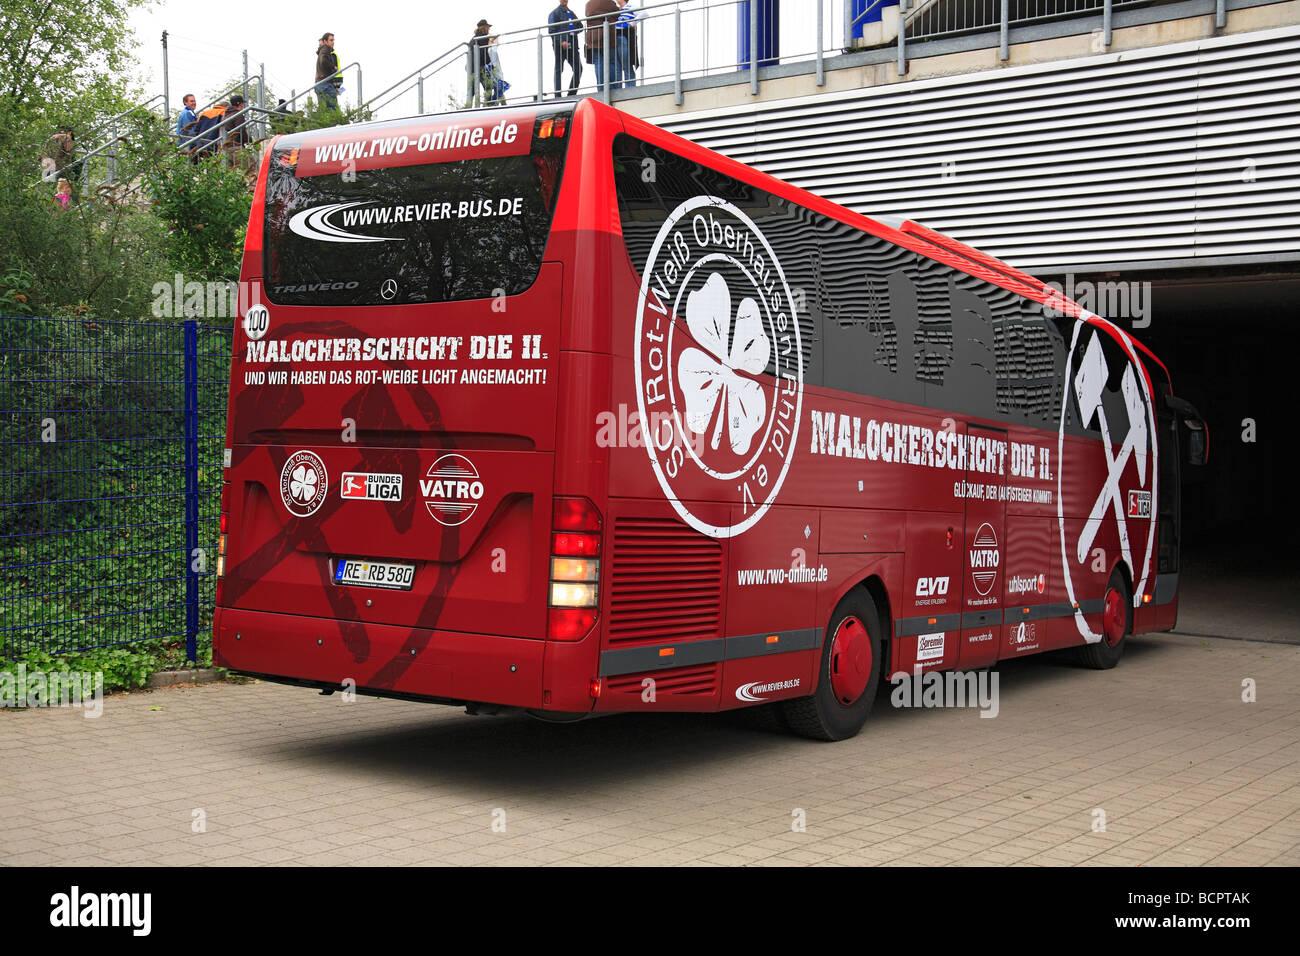 D-Duisburg, Ruhr area, North Rhine-Westphalia, sports, football, 2nd Bundesliga, 2008/2009, MSV Duisburg versus - Stock Image